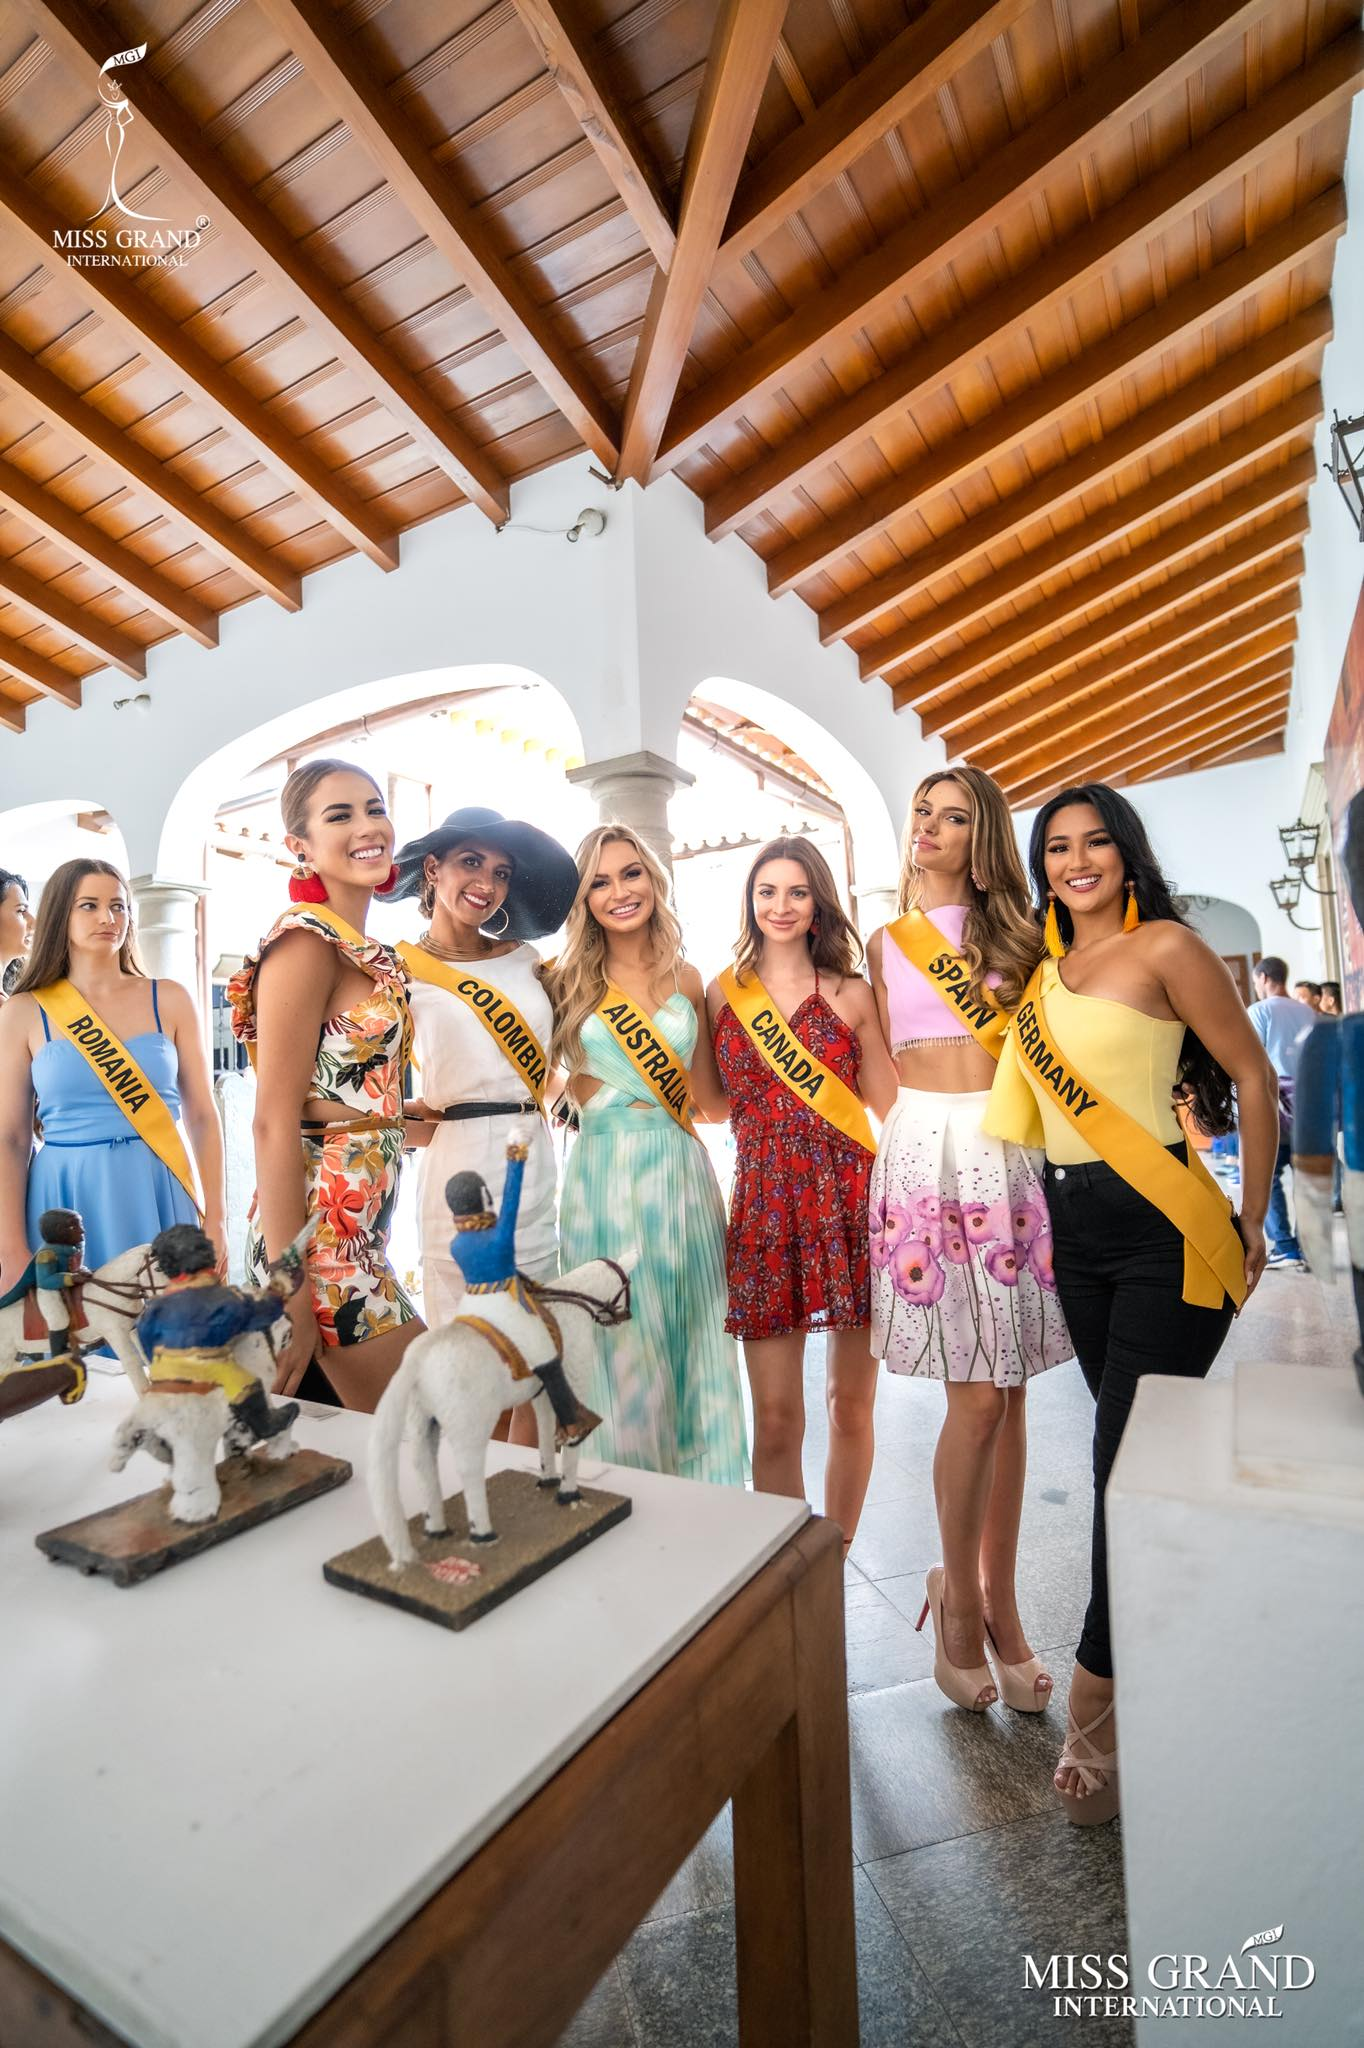 ainara de santamaria villamor, top 21 de miss grand international 2019/miss world cantabria 2018/miss earth spain 2017. - Página 14 72529210